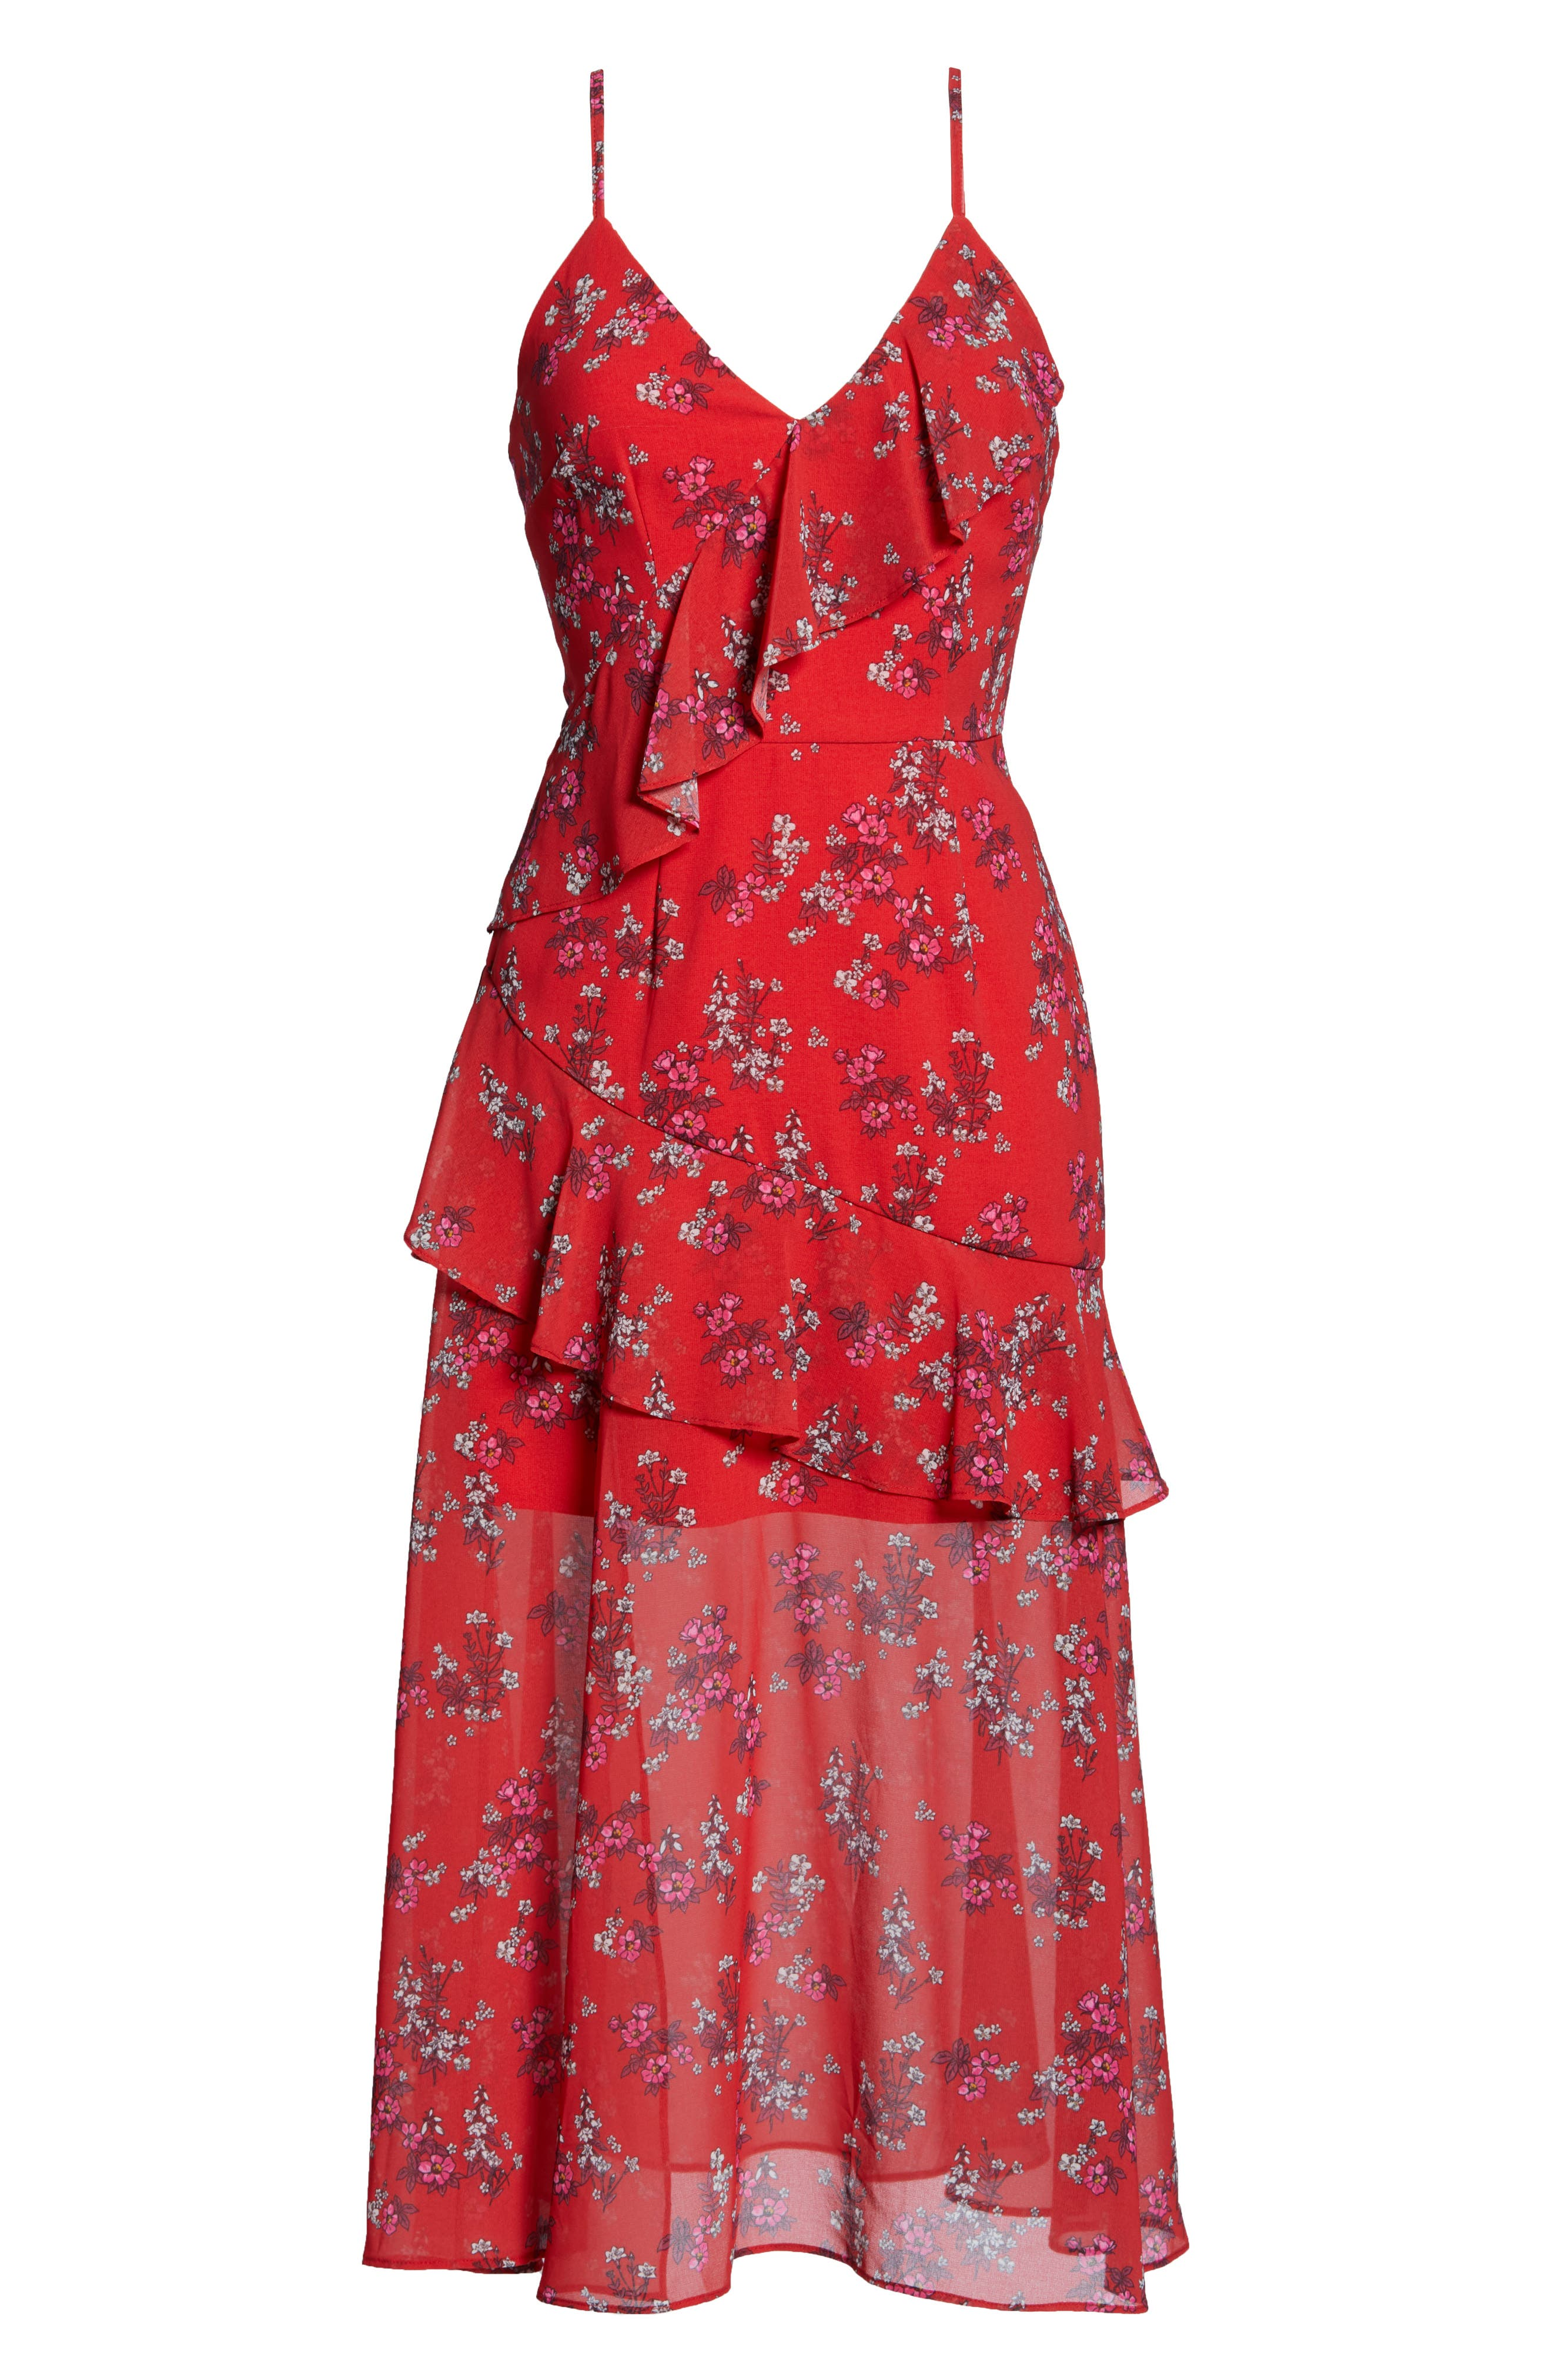 KEEPSAKE THE LABEL,                             Heart & Soul Ruffle Detail Tea Length Dress,                             Alternate thumbnail 7, color,                             SMALL RED FLORAL